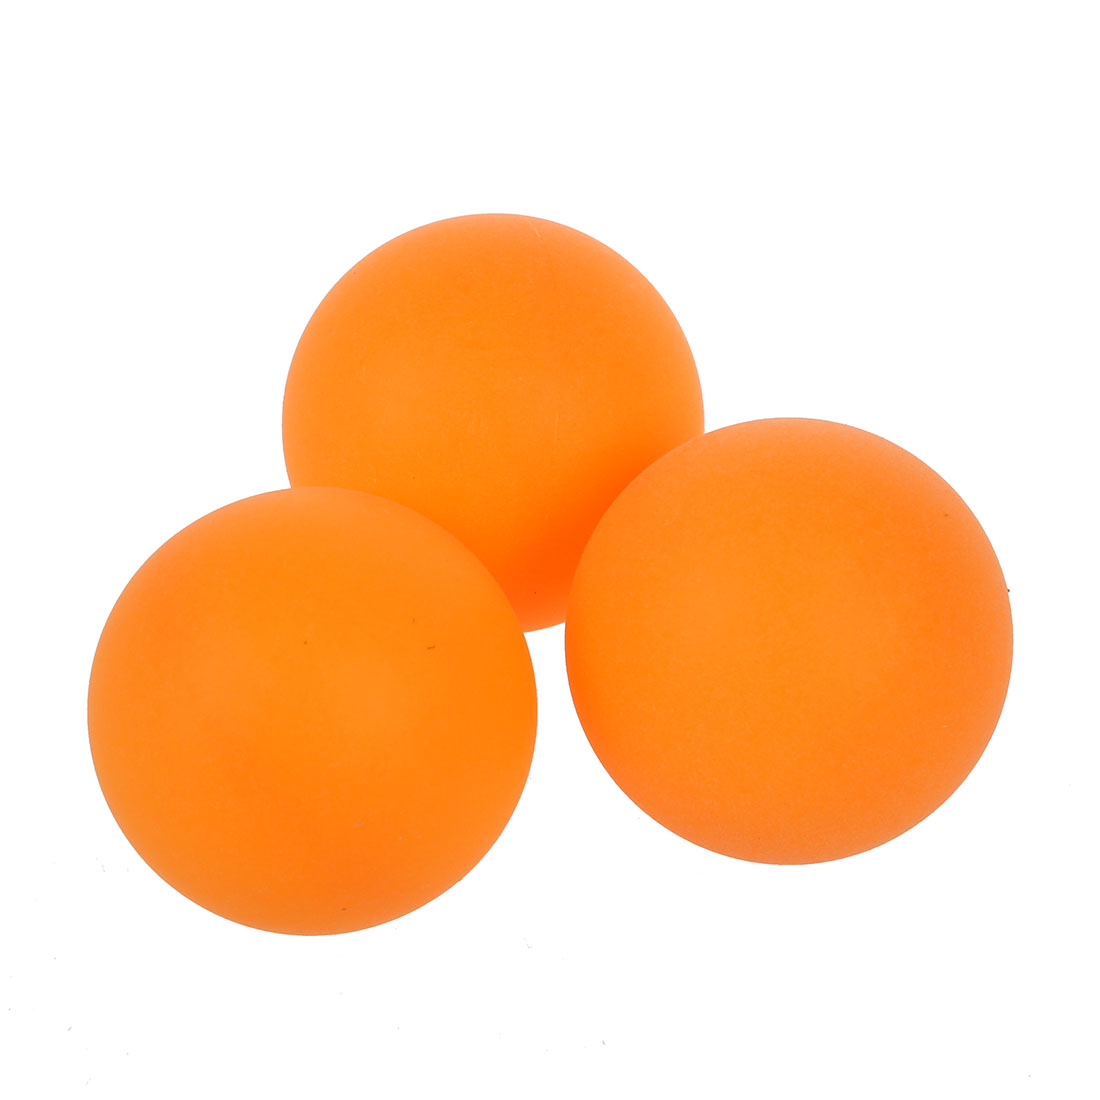 Table tennis ball measurements